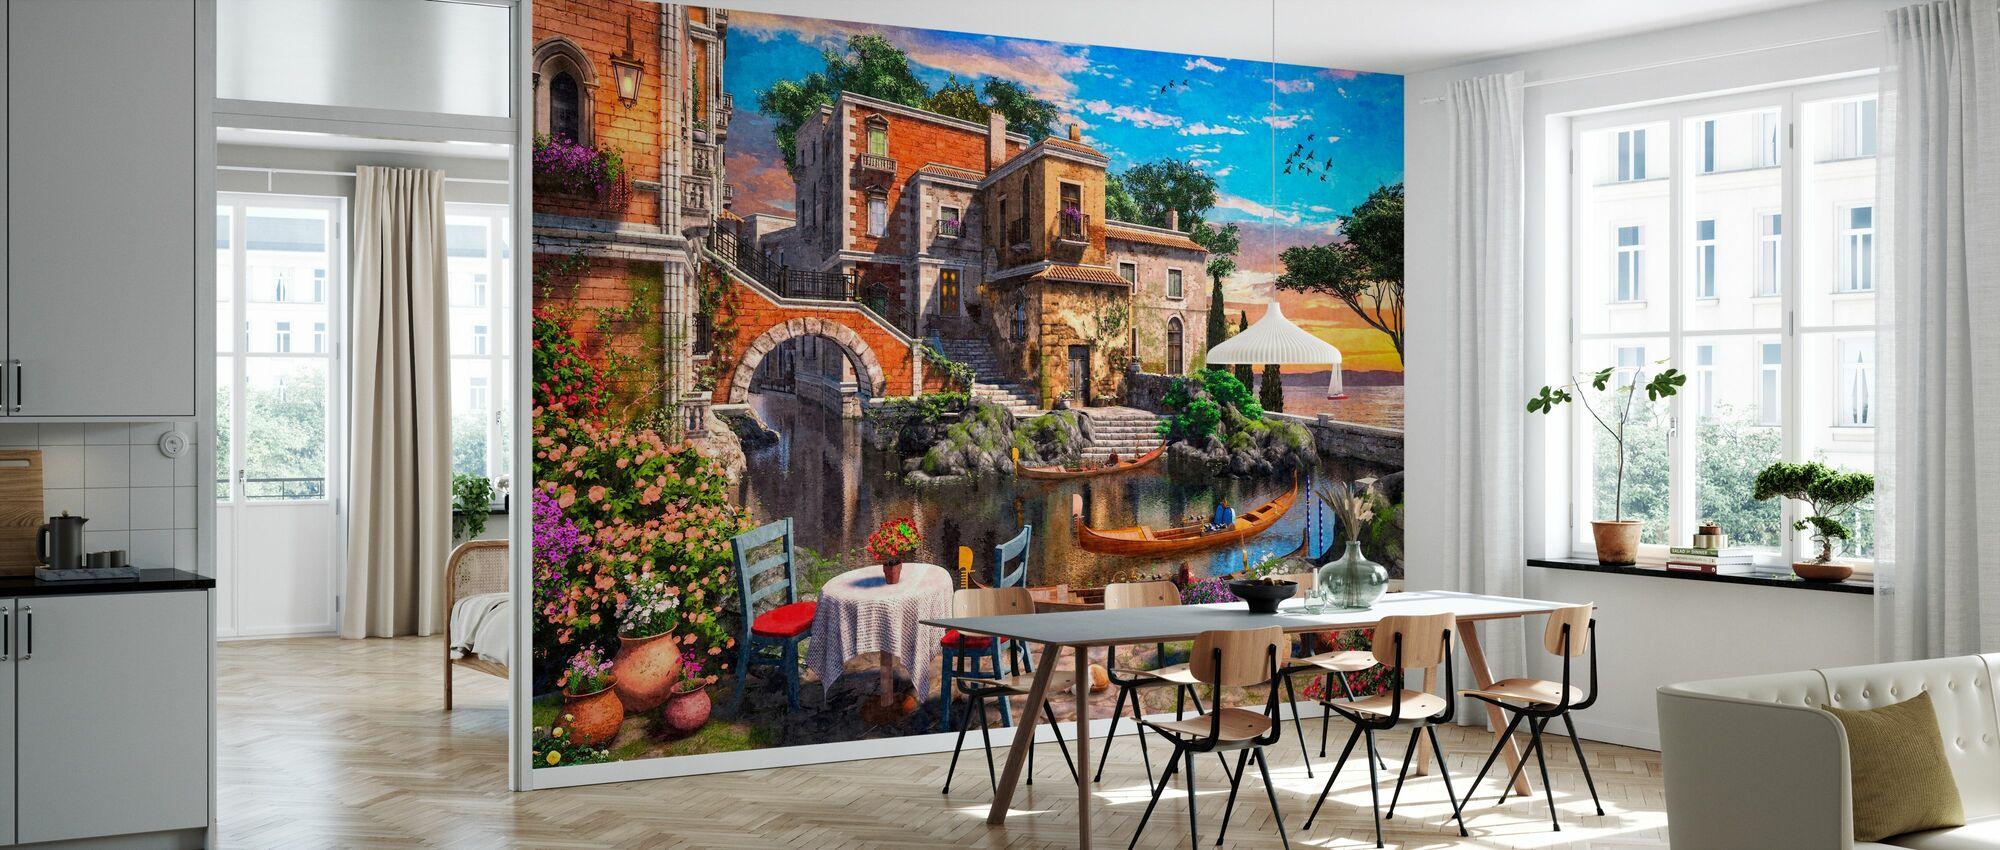 Venice Terrace View - Wallpaper - Kitchen